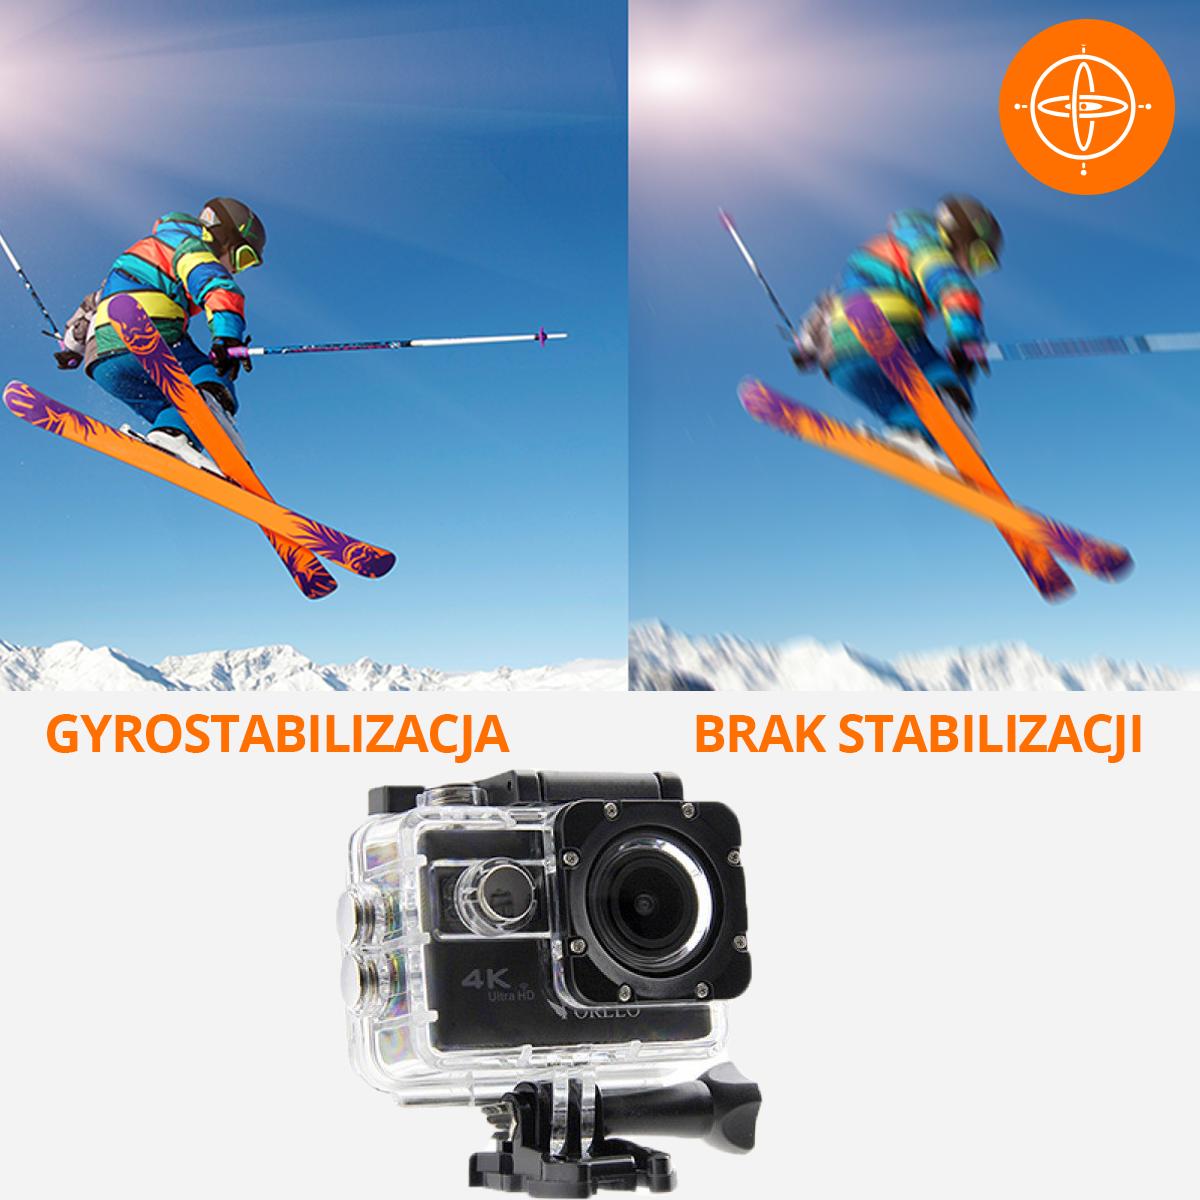 kamera-sportowa-dotykowy-ekran-orllo-pl